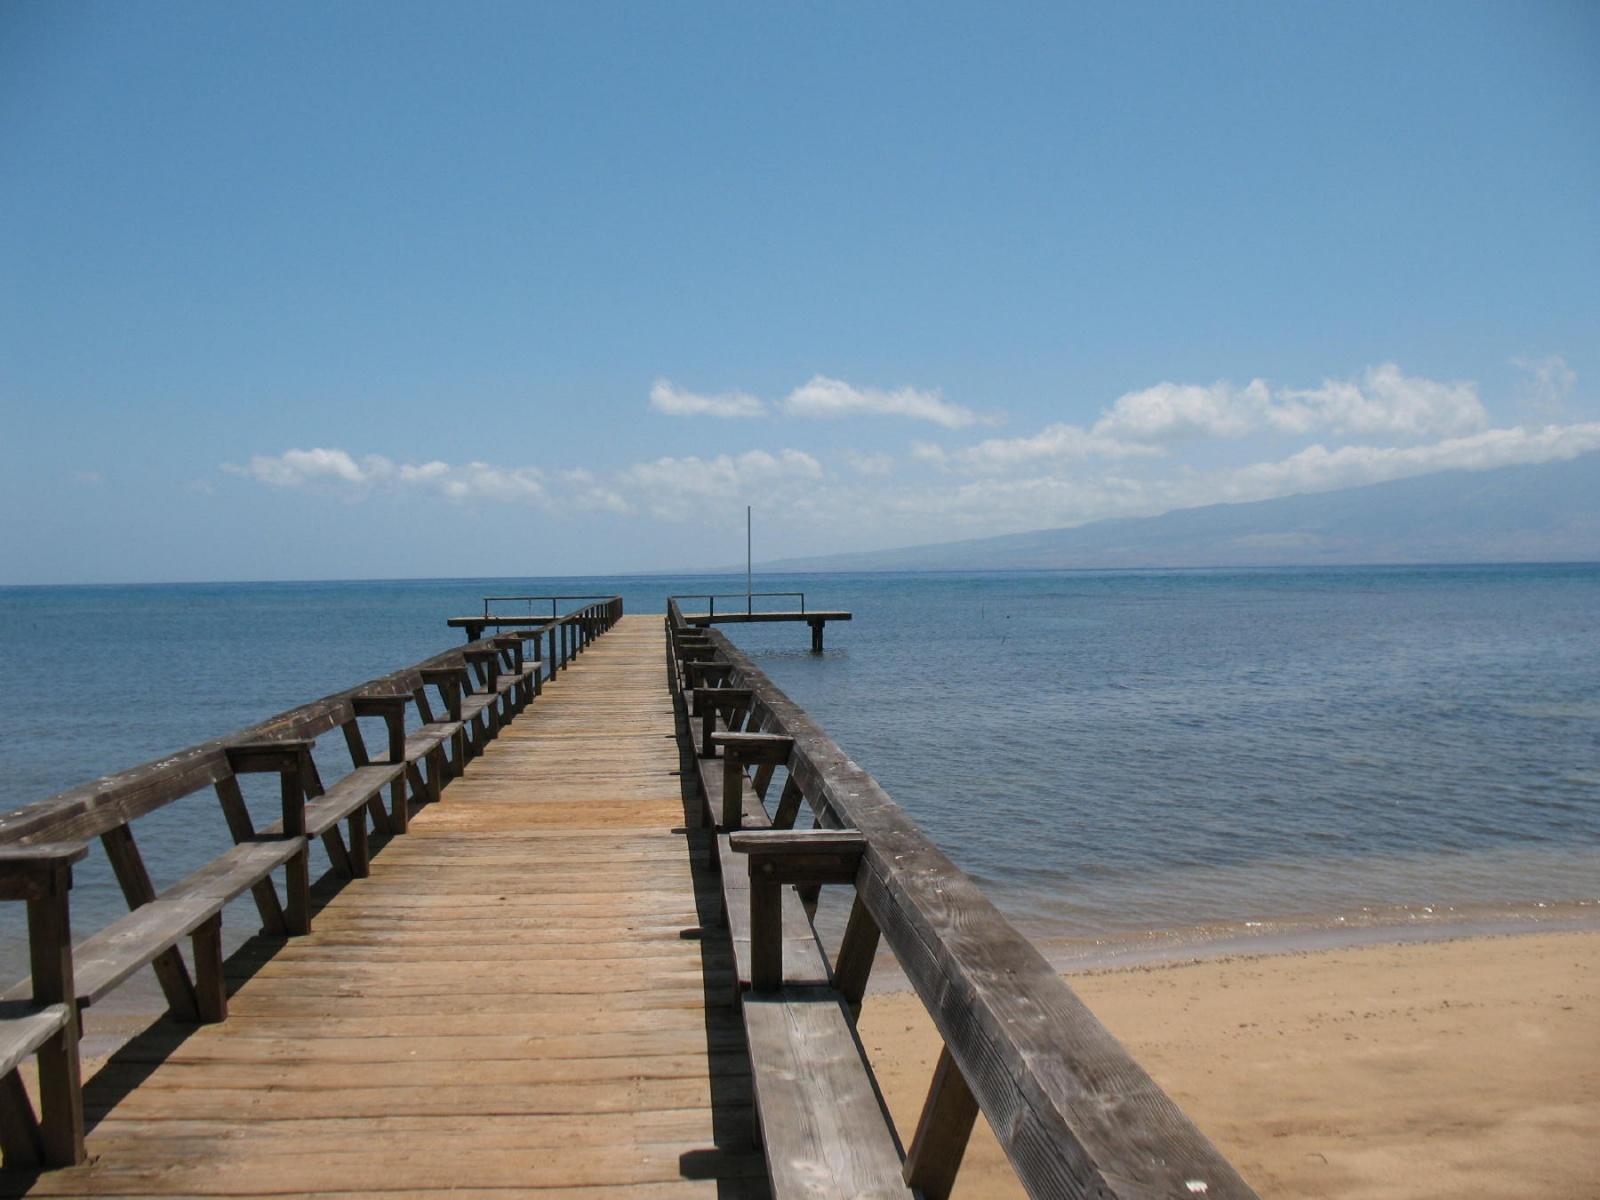 Click image for larger version  Name:Lanai Club Pier.jpg Views:336 Size:392.8 KB ID:41533